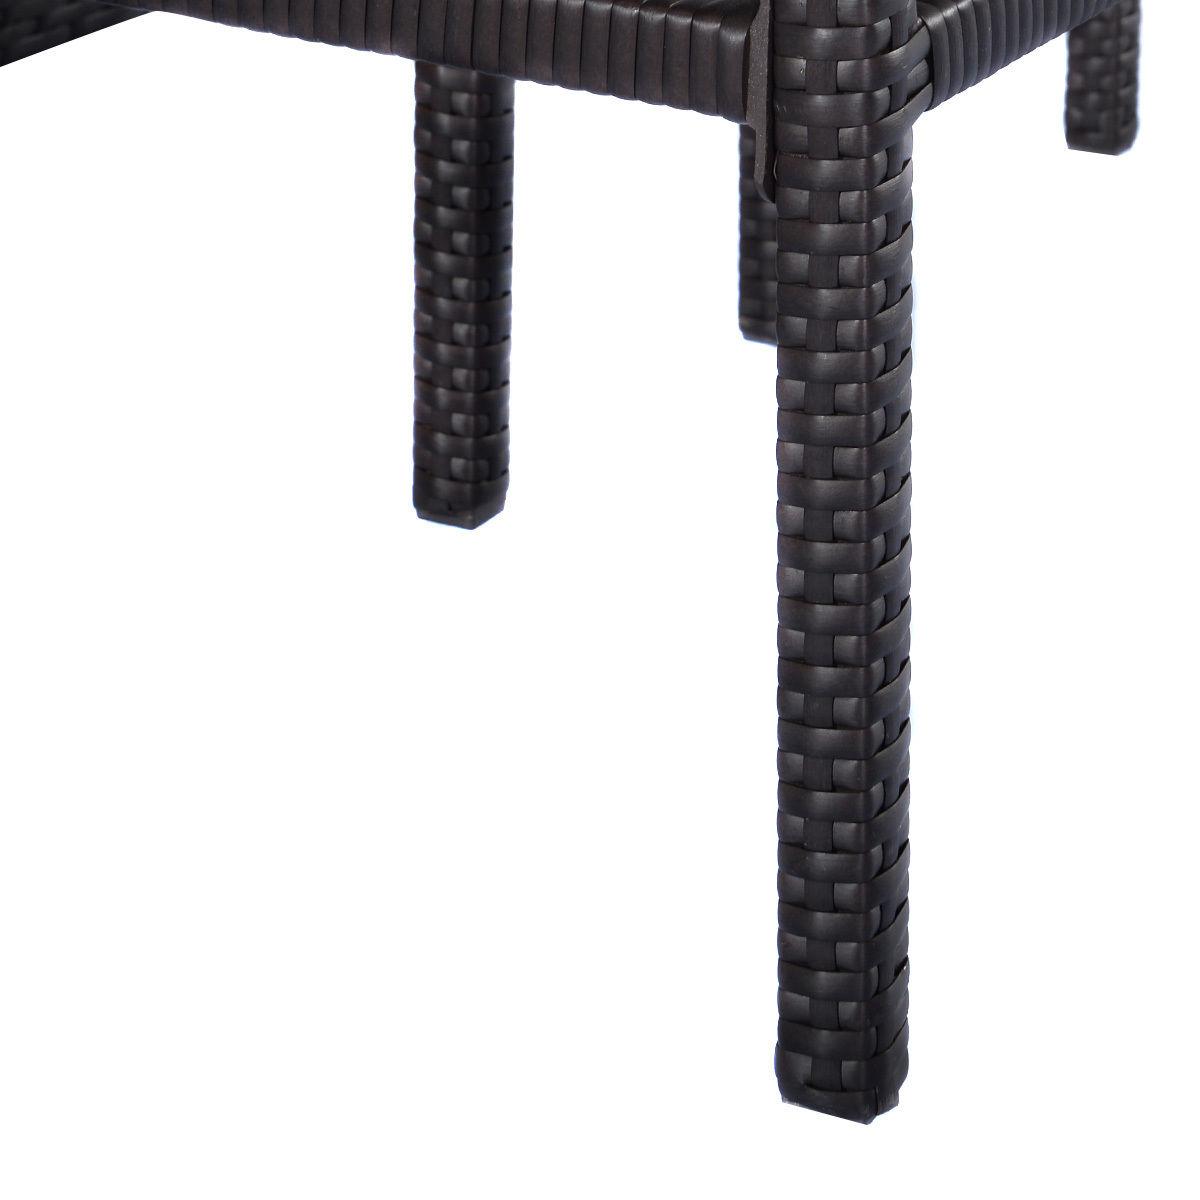 Costway 3PCS Rattan Wicker Bar Set Patio Outdoor Table & 2 Stools Furniture Brown 7